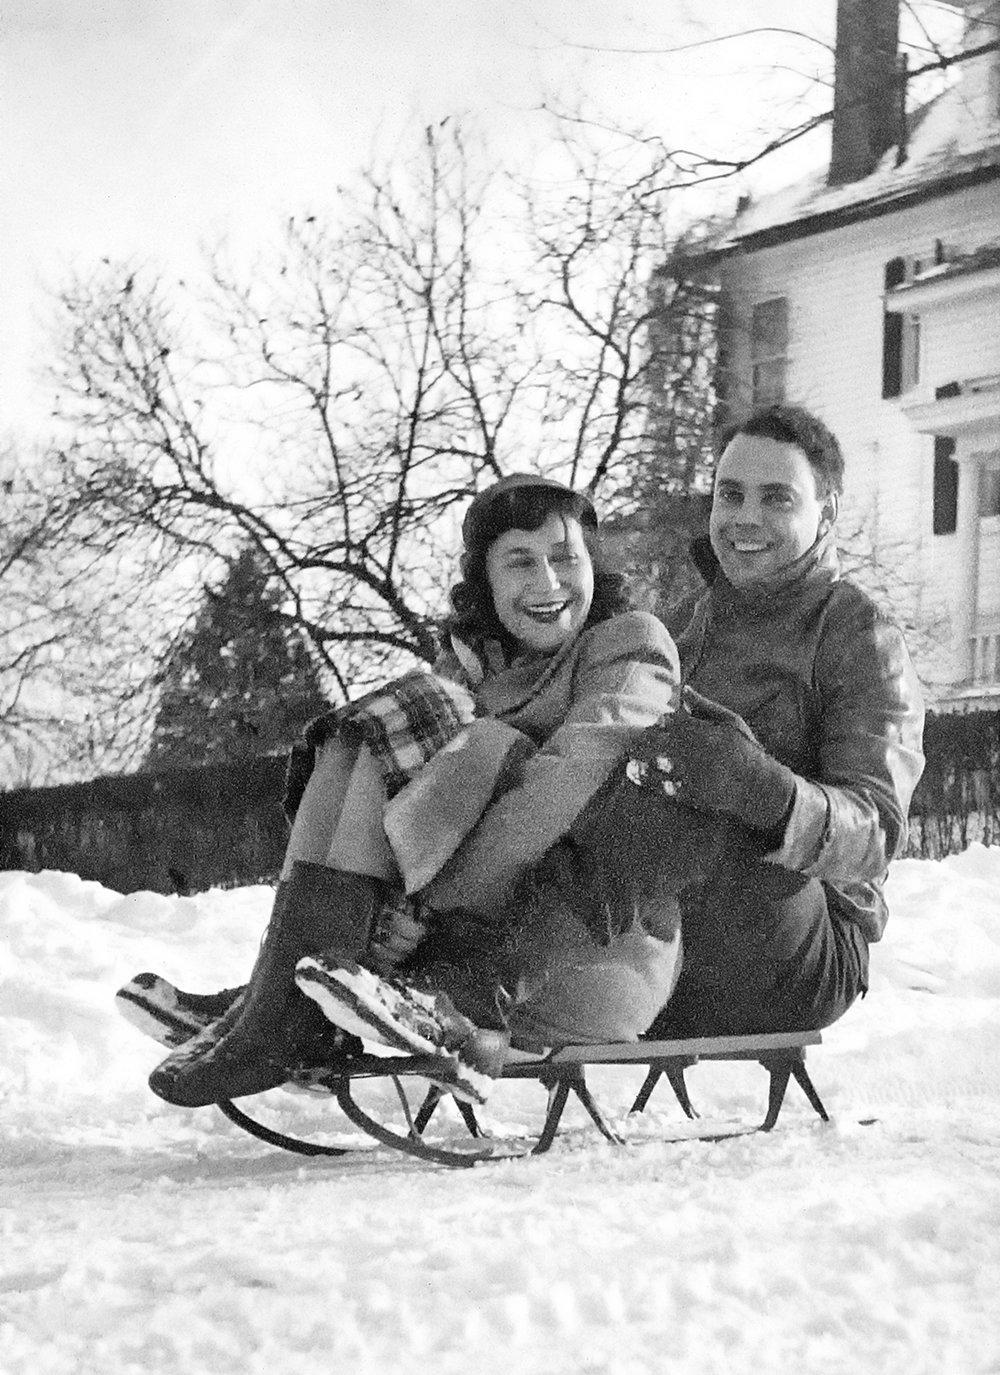 Anne and Doug sledding in Mt. Washington, Winter of 1947-48